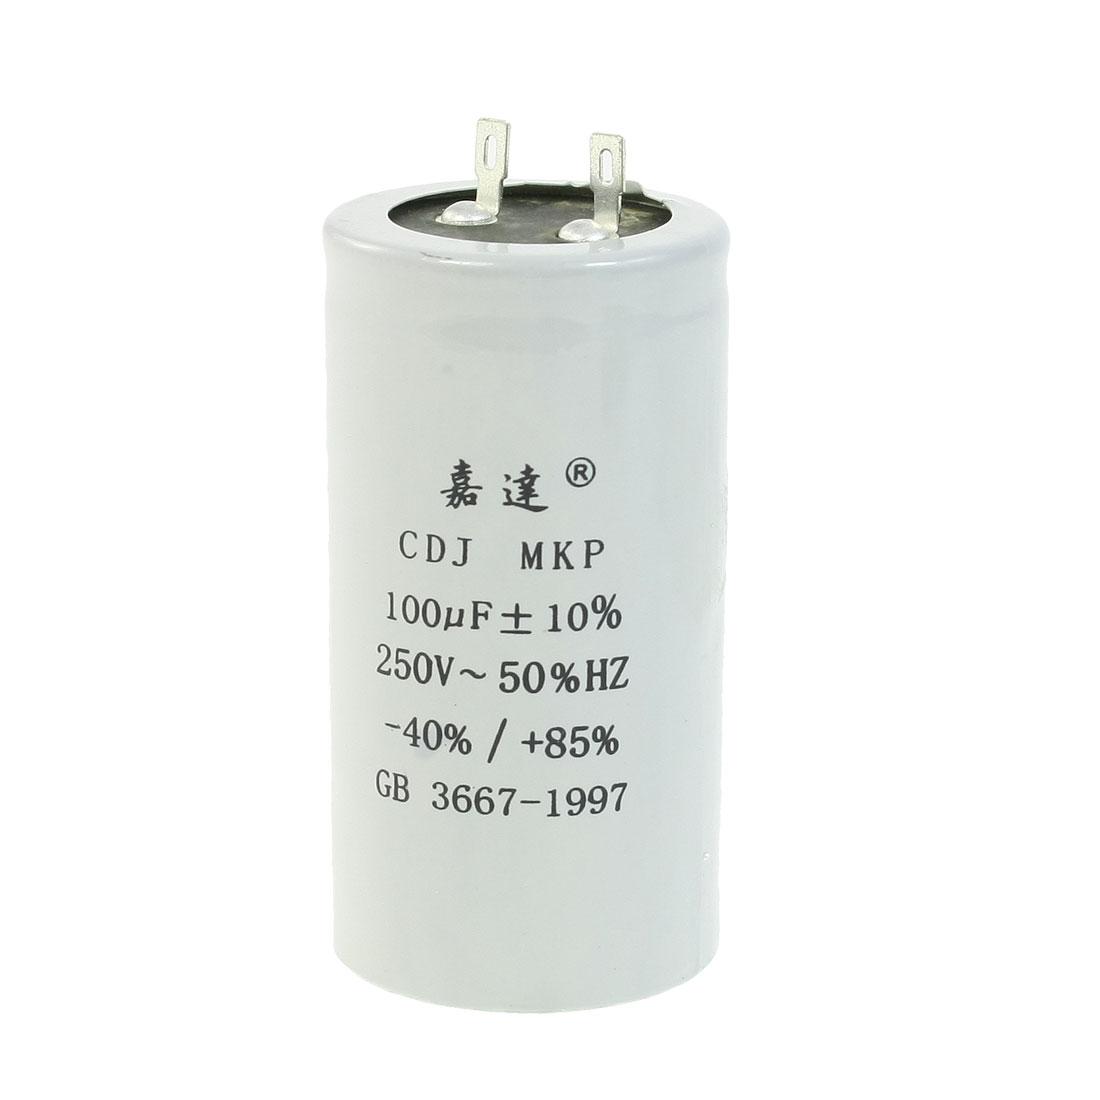 AC 250V 100uF 2 Terminals Non Polar CDJ MKP Motor Starting Capacitor